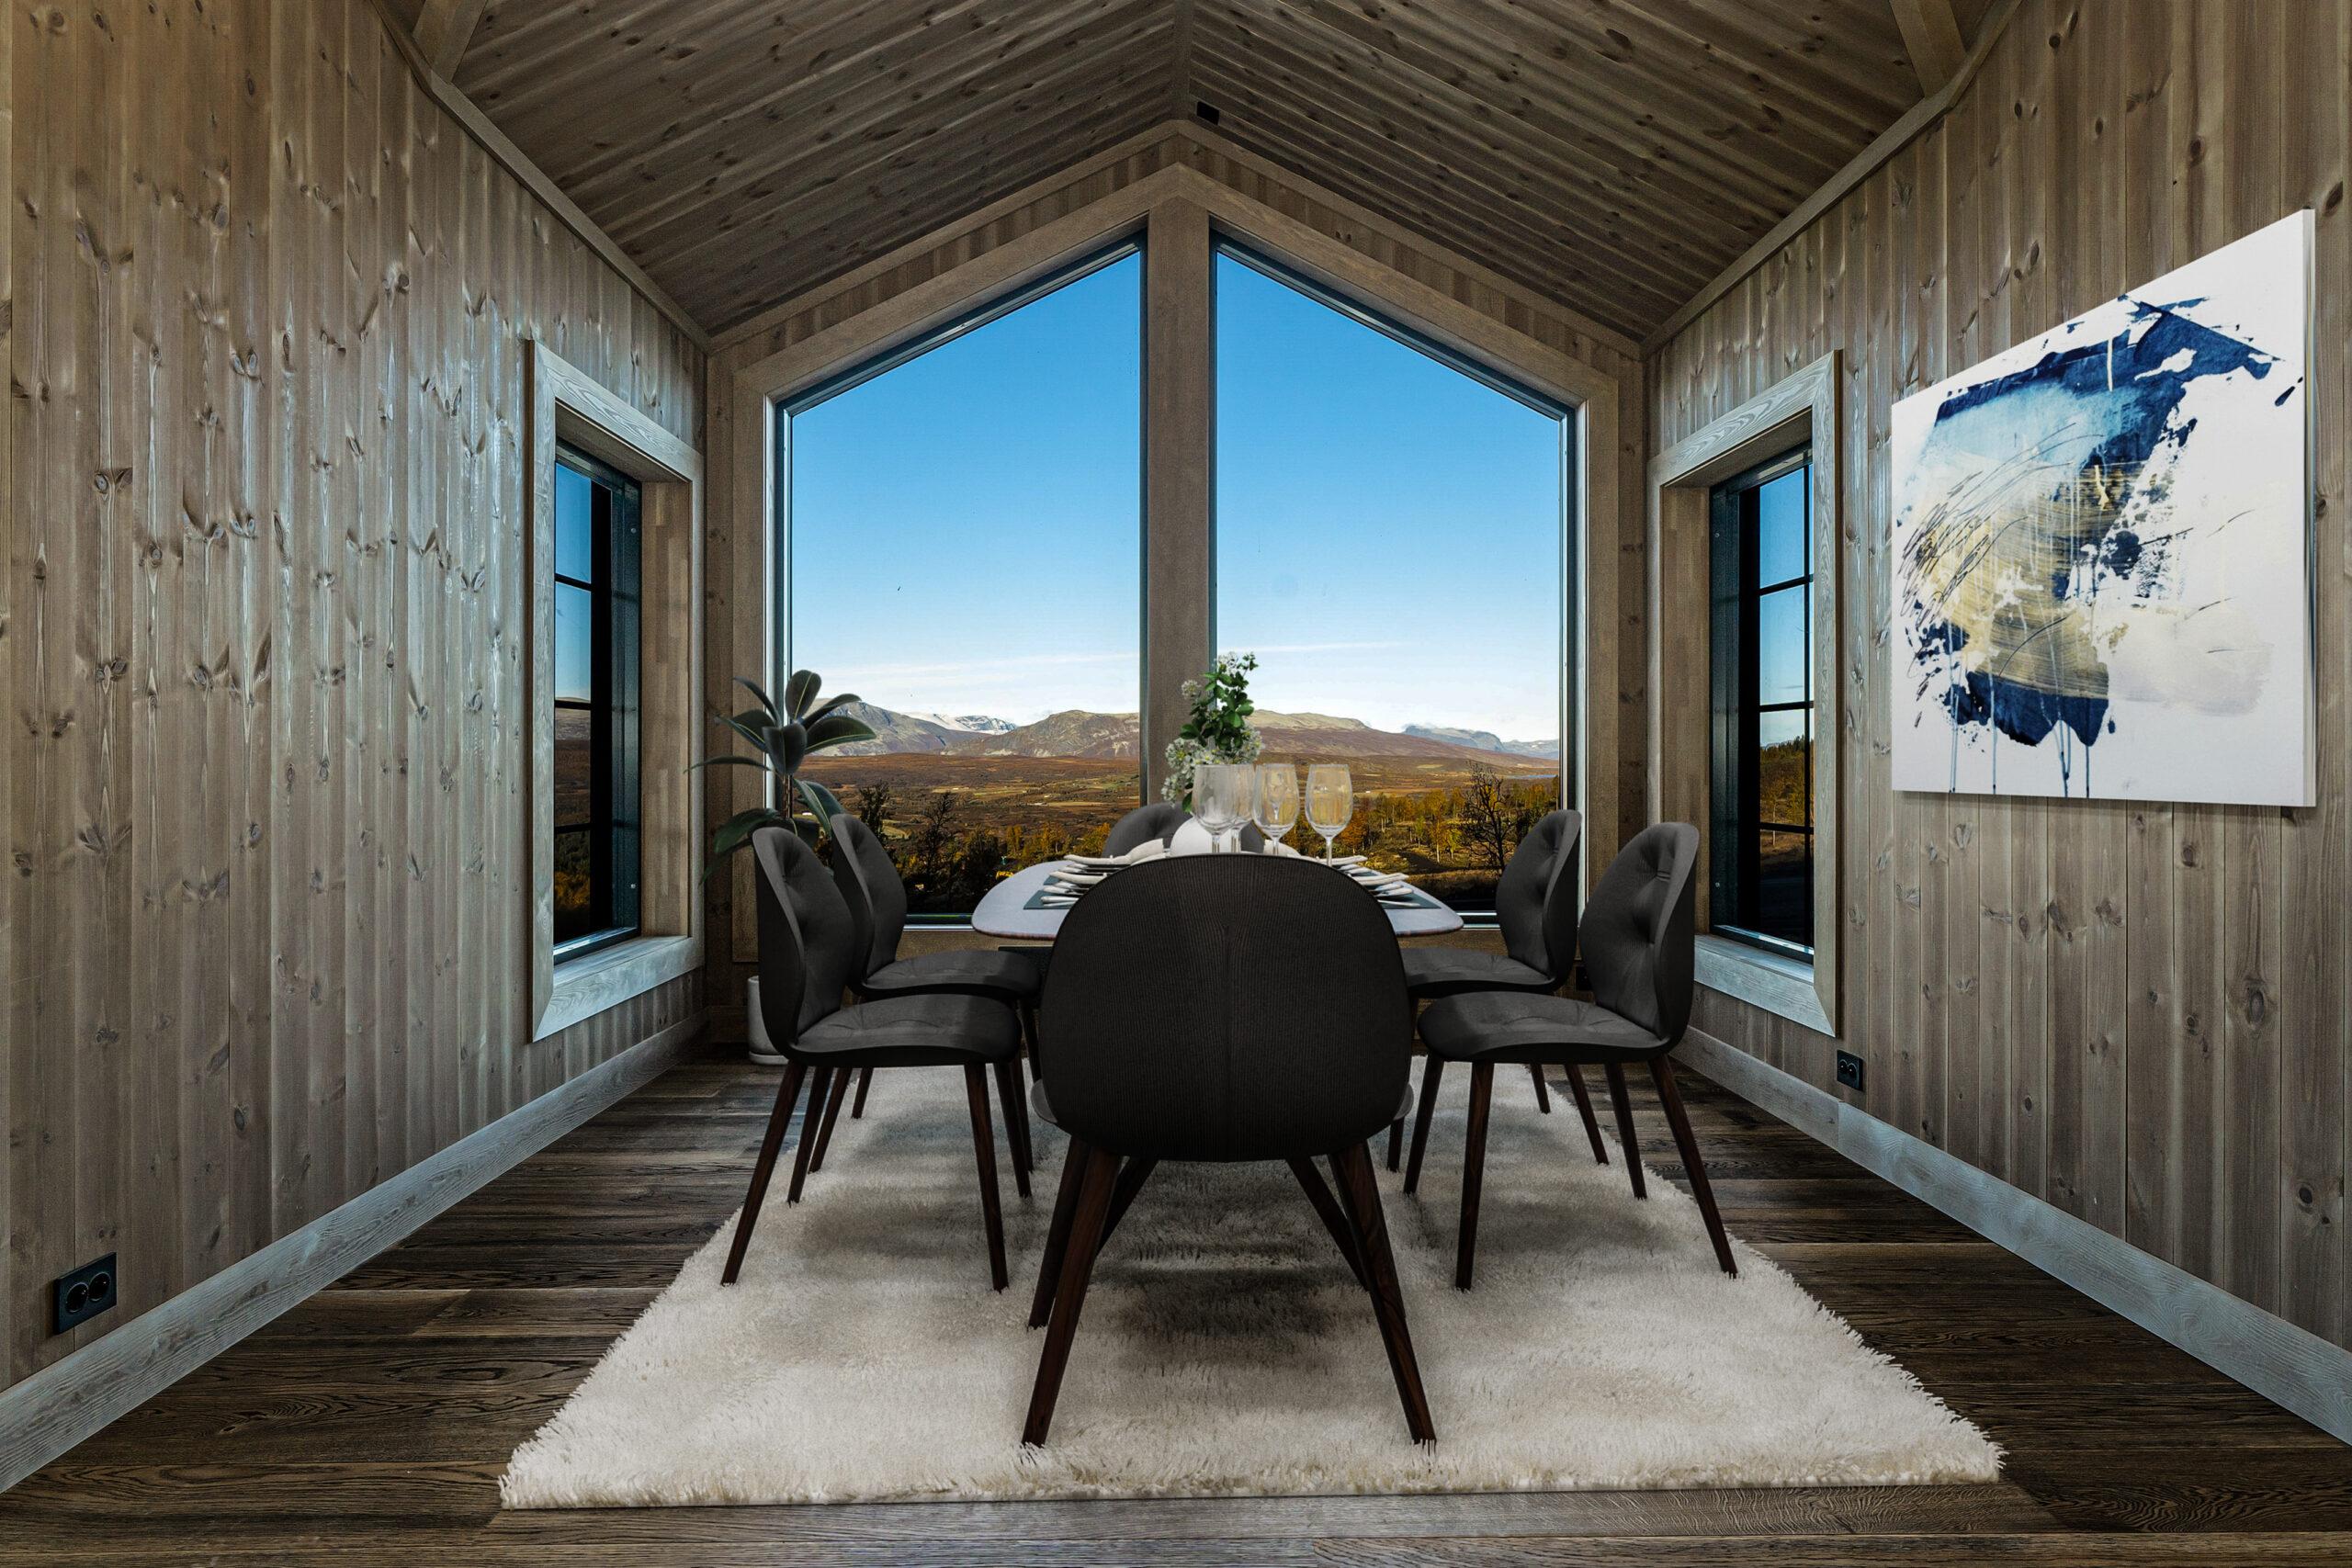 utsikt stue fjellet panorama vindu magnor